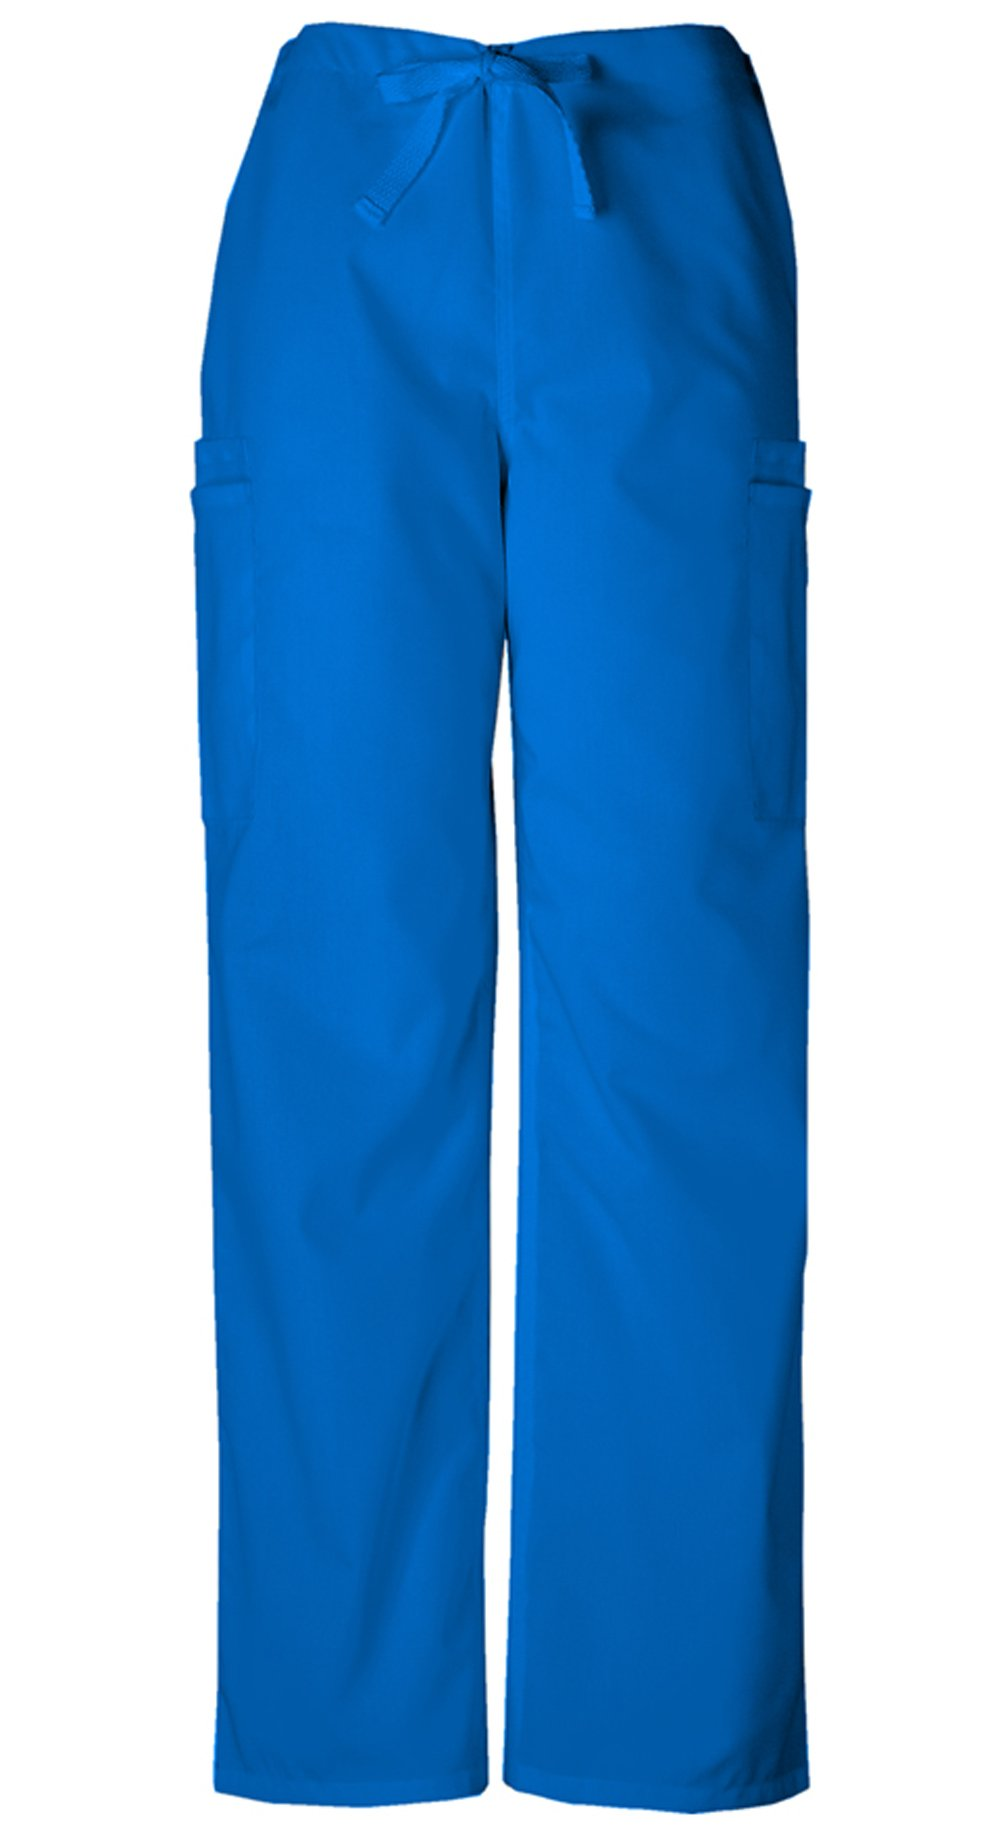 Scrubs - Cherokee Authentic Workwear Unisex 7 Pocket Cargo Pant (Royal, XL)